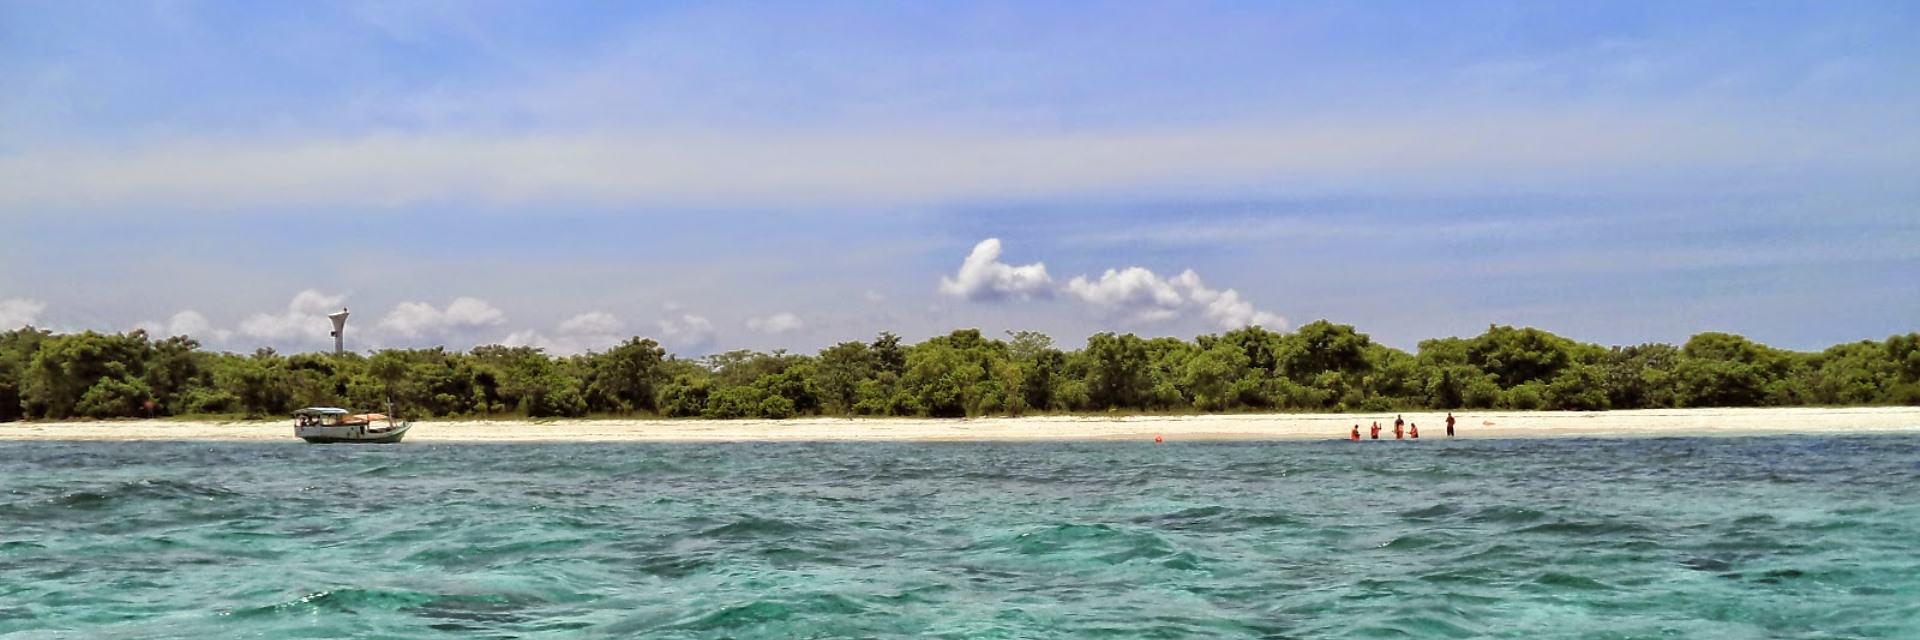 Pulau Tabuhan Pembuat Rasa Sayange Pasangan Bledak Pulau Tabuhan Pembuat Rasa Sayange Pasangan Bledak - Dolan Dolen